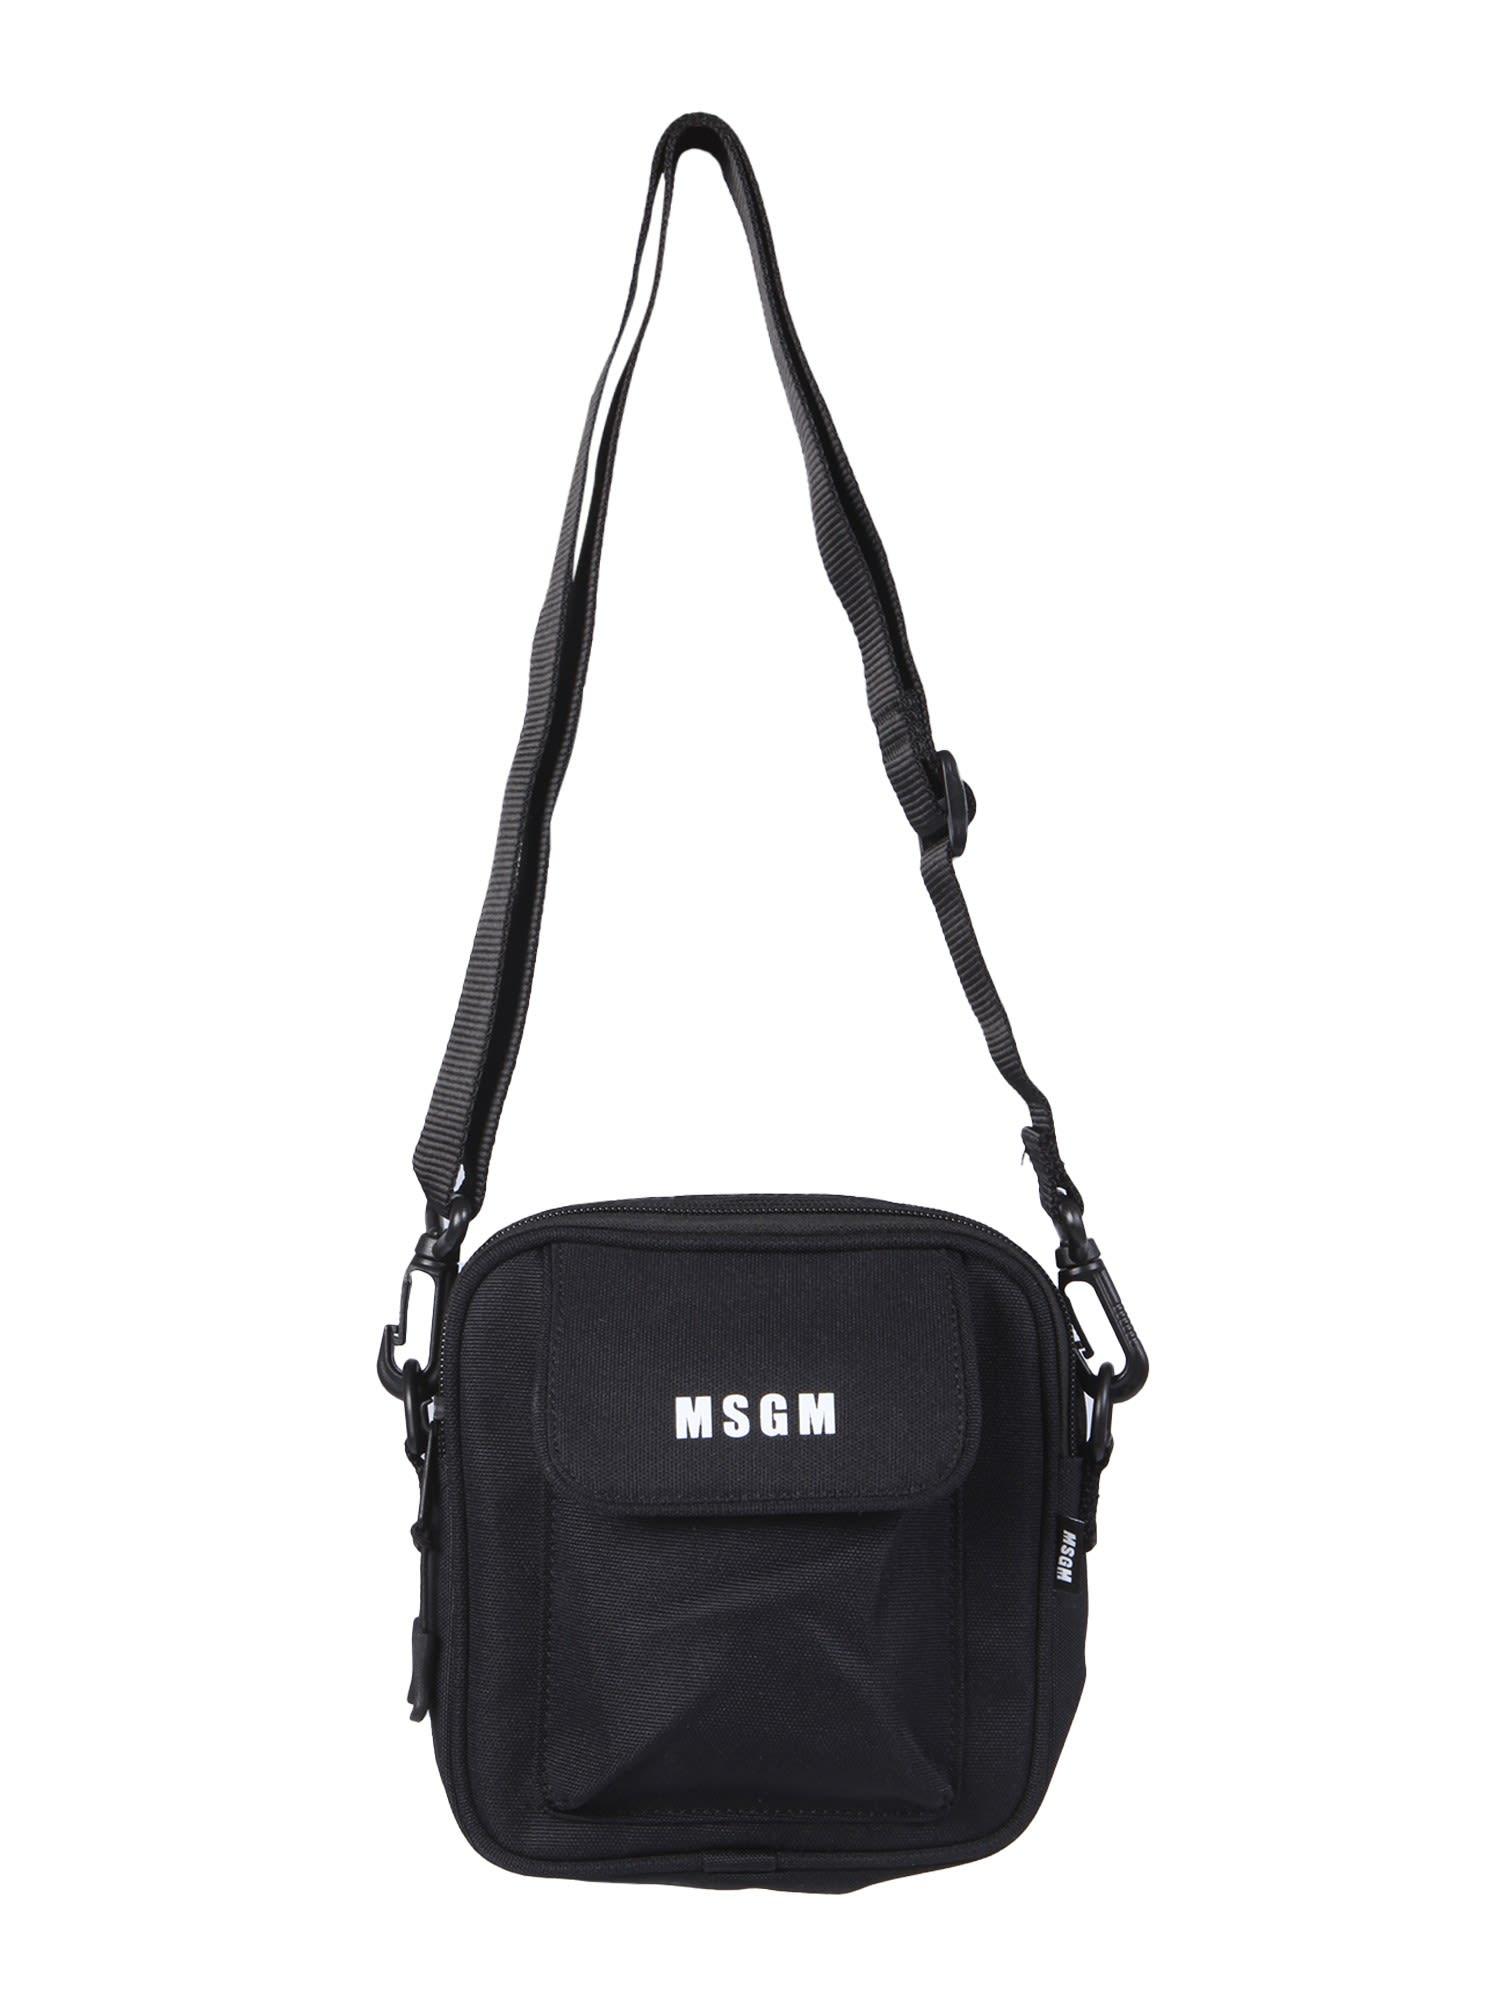 Msgm Messengers SHOULDER BAG WITH MICRO LOGO